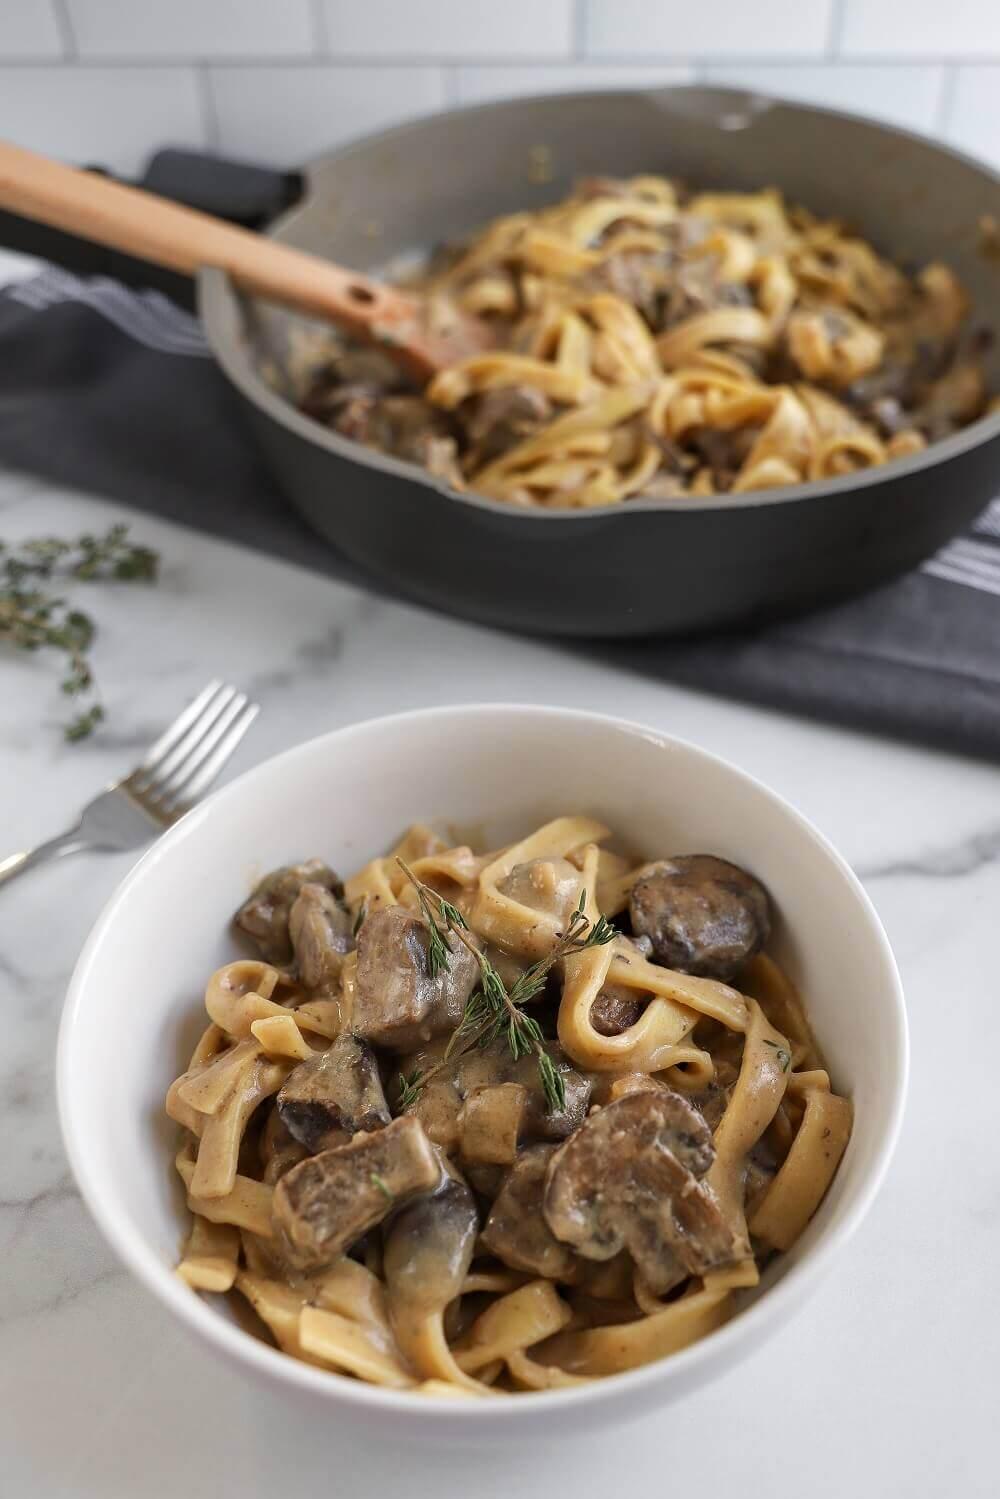 Classic Mushroom and Beef Stroganoff